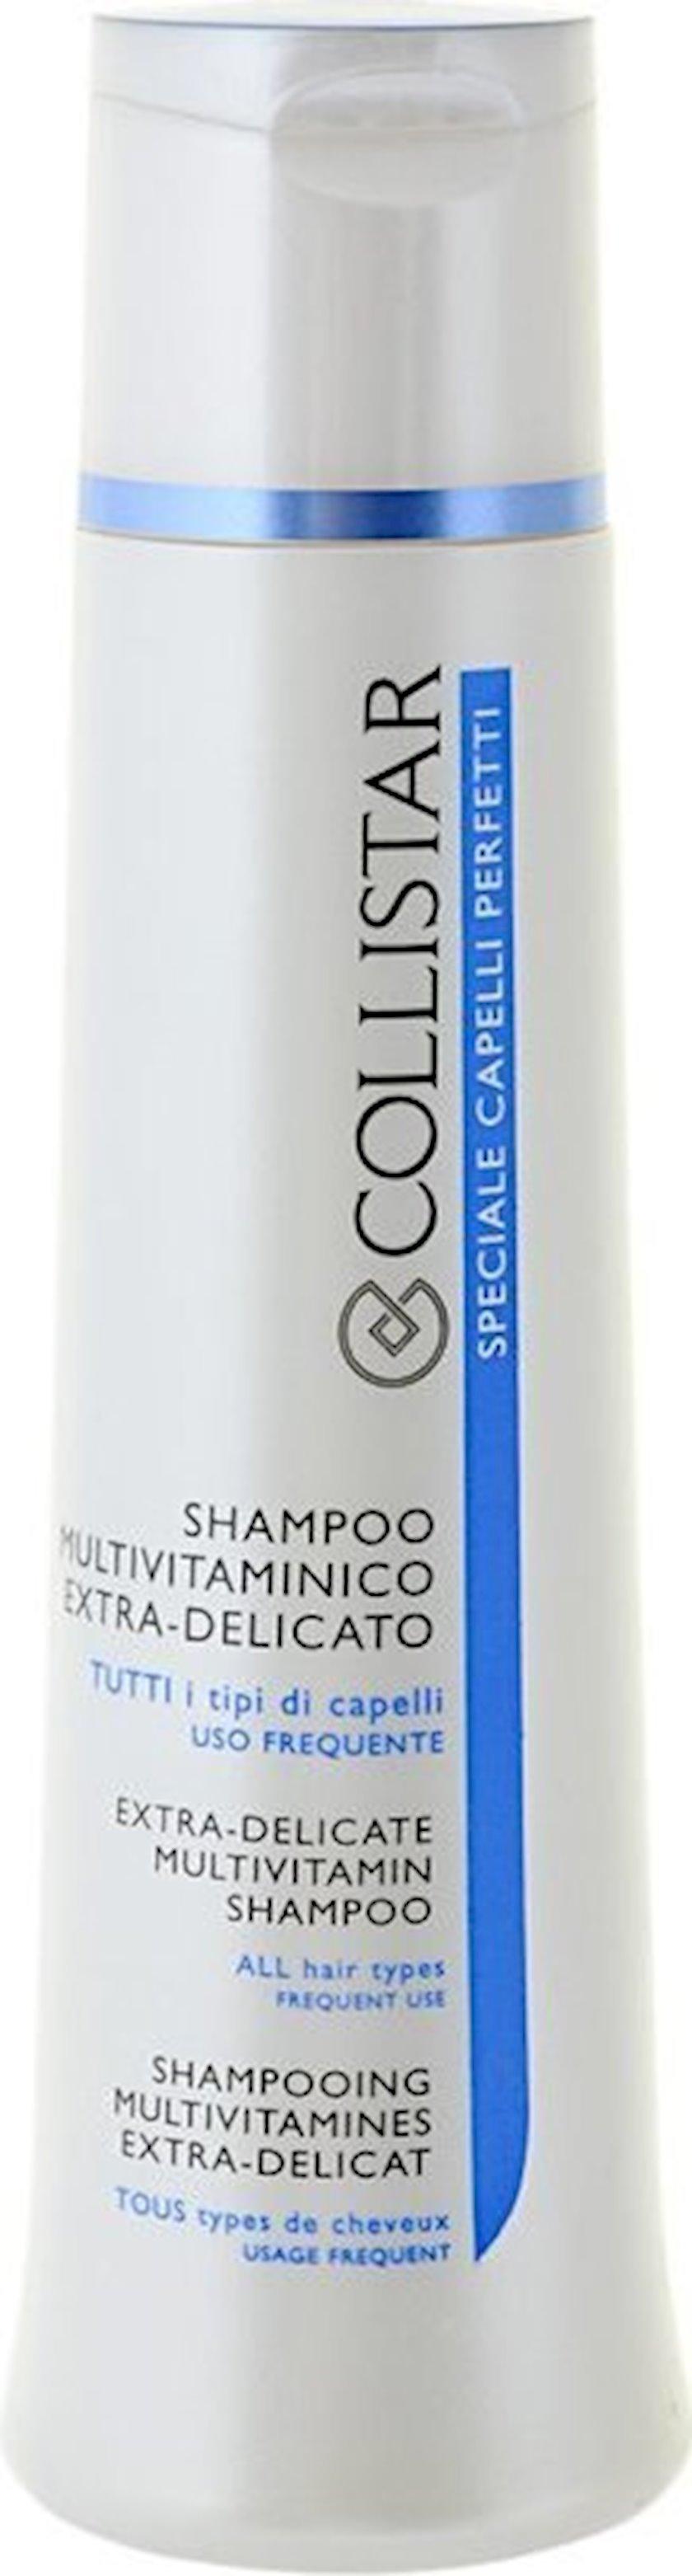 Şampun Collistar Extra-Delicate Multivitamin Shampoo 250 ml